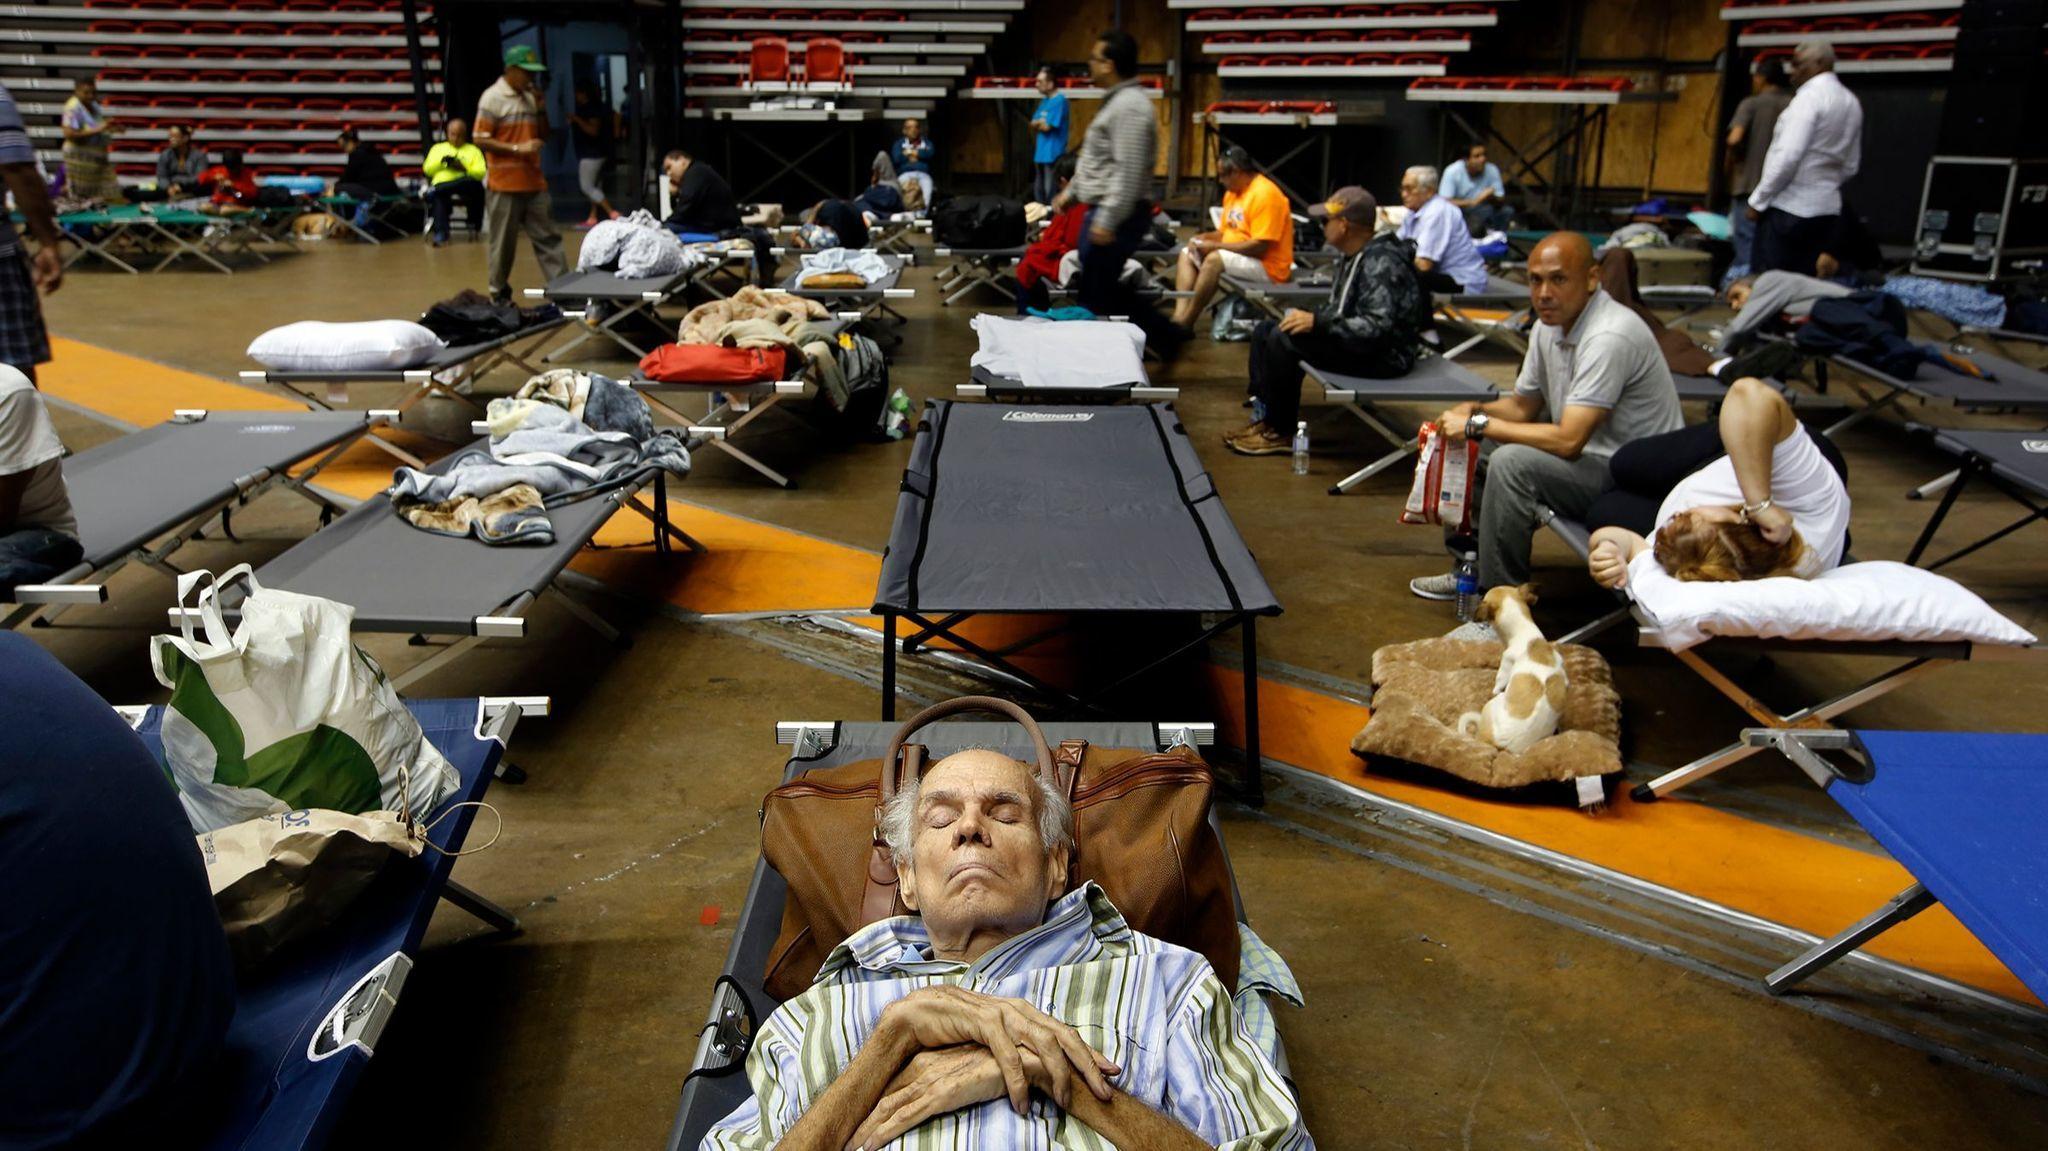 SAN JUAN, PUERTO RICO--SEPT. 19, 2017--Hundreds of San Juan residents have taken shelter at the Robe